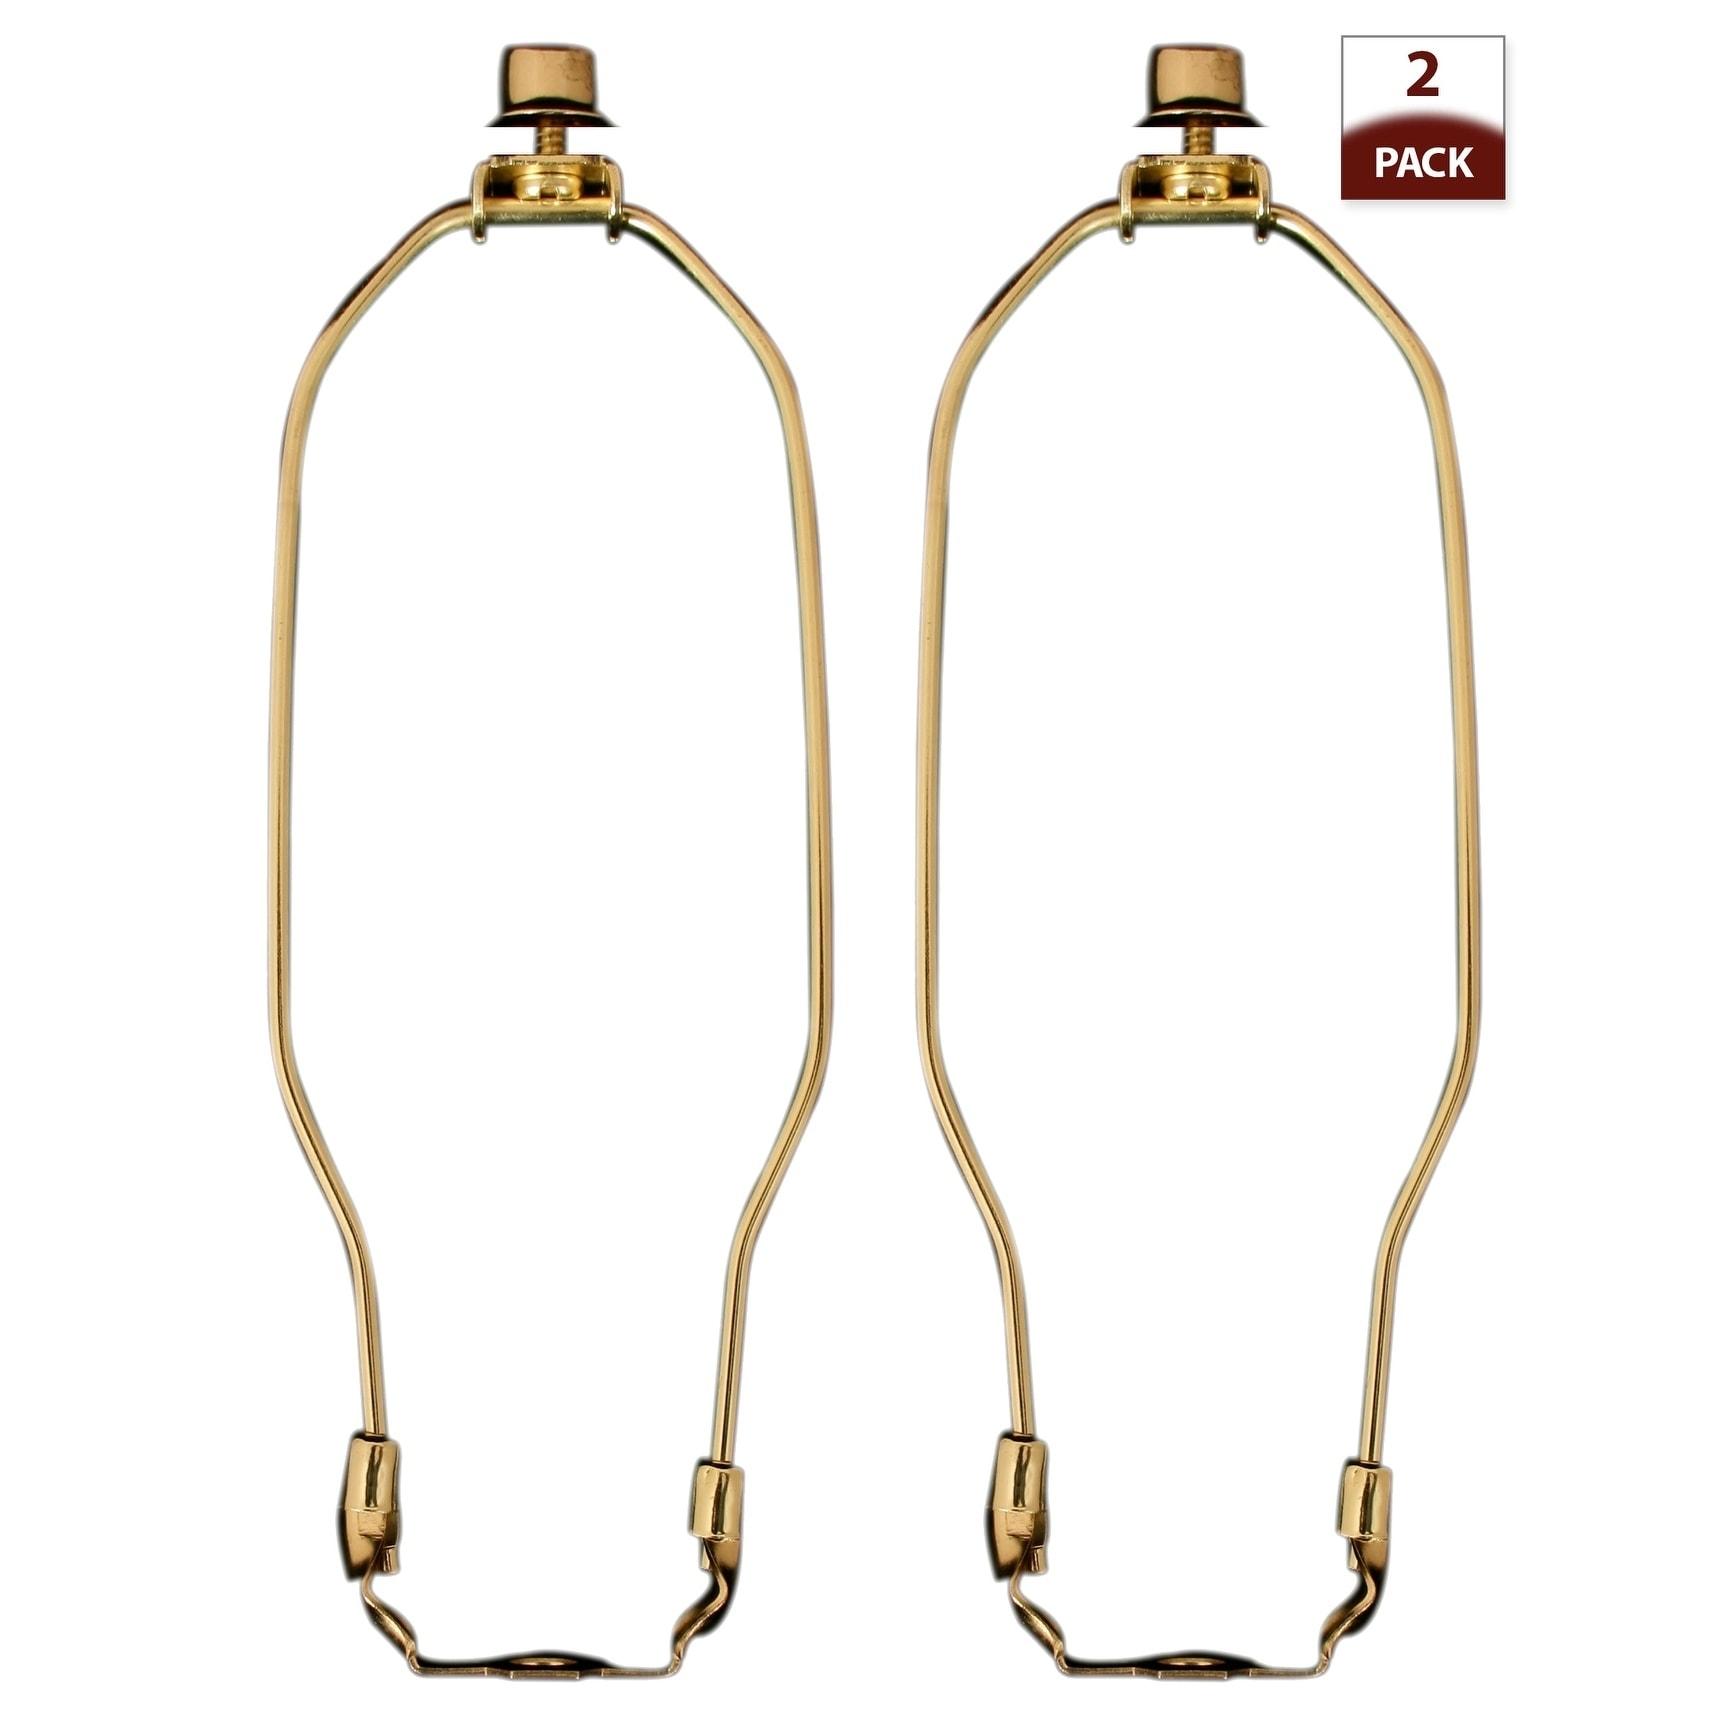 7 Royal Designs HA-1002-7BR-2 Lamp Harp Finial And Lamp Harp Holder Set Polished Brass